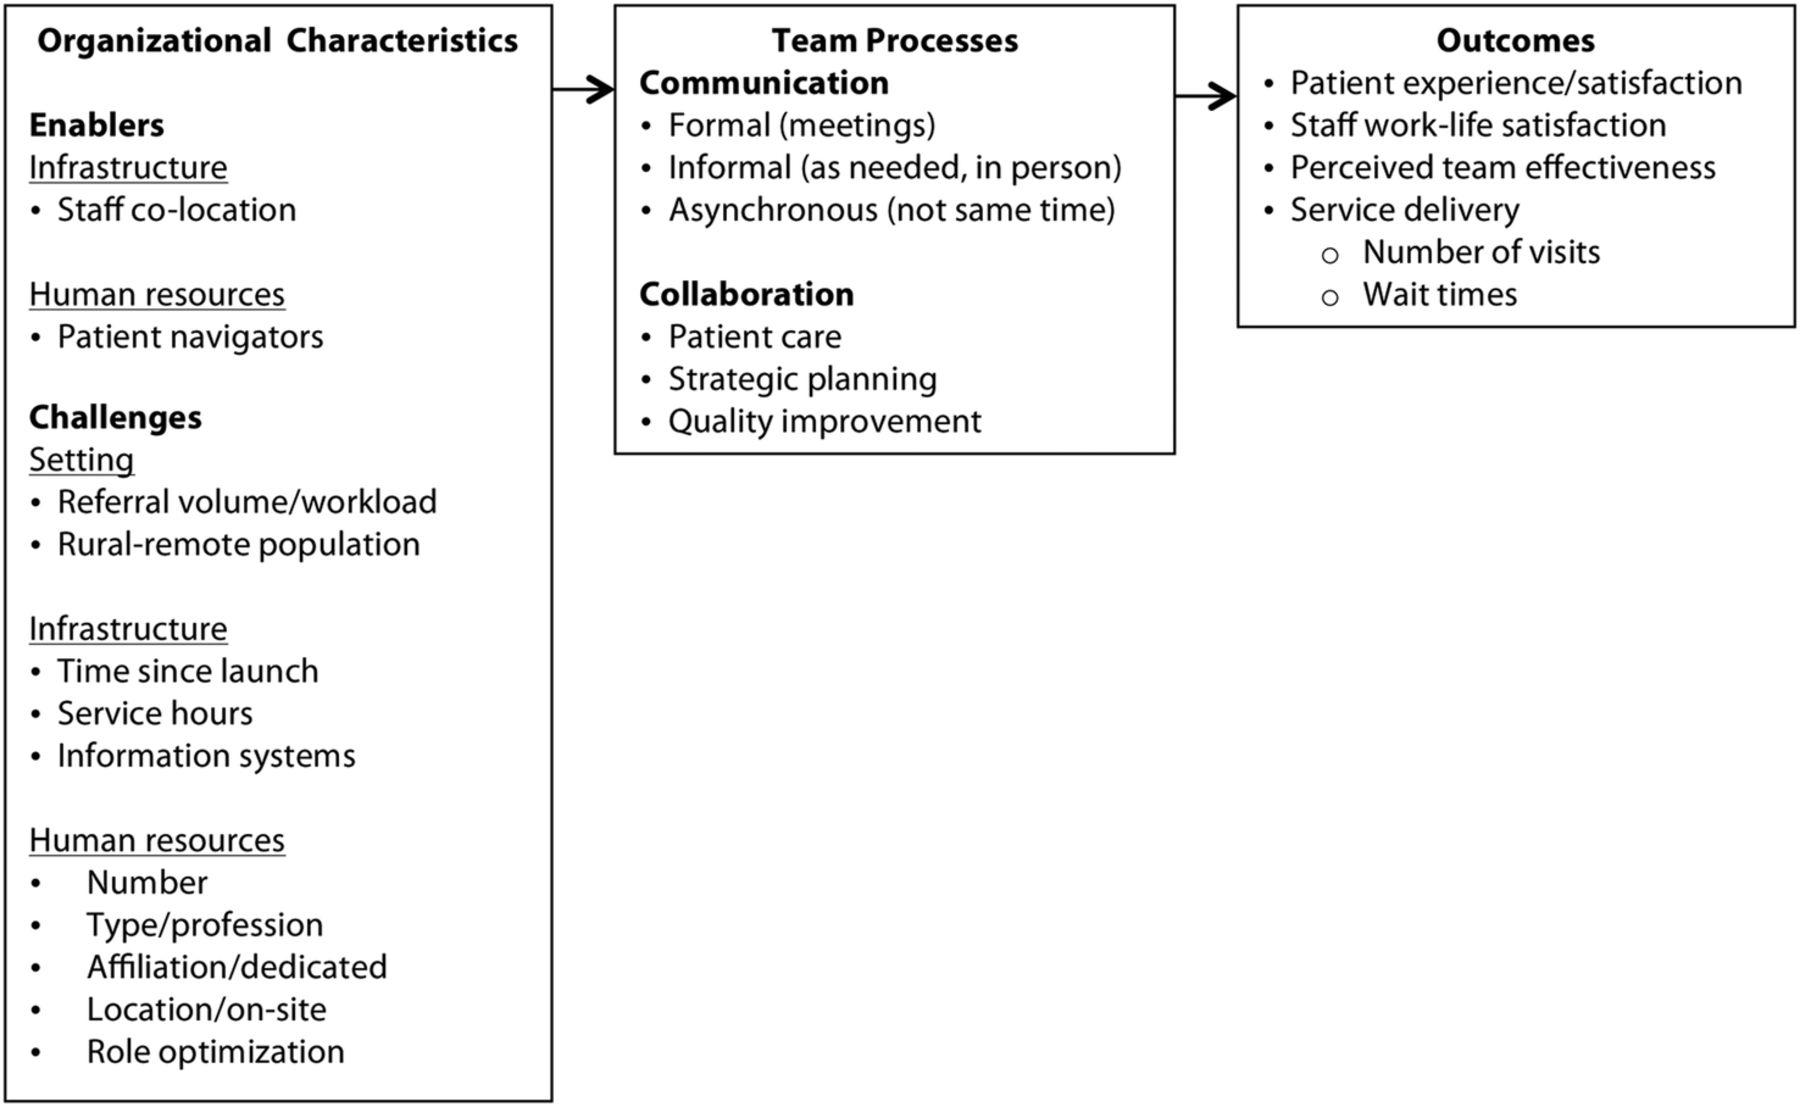 how do organisational characteristics influence teamwork and figure